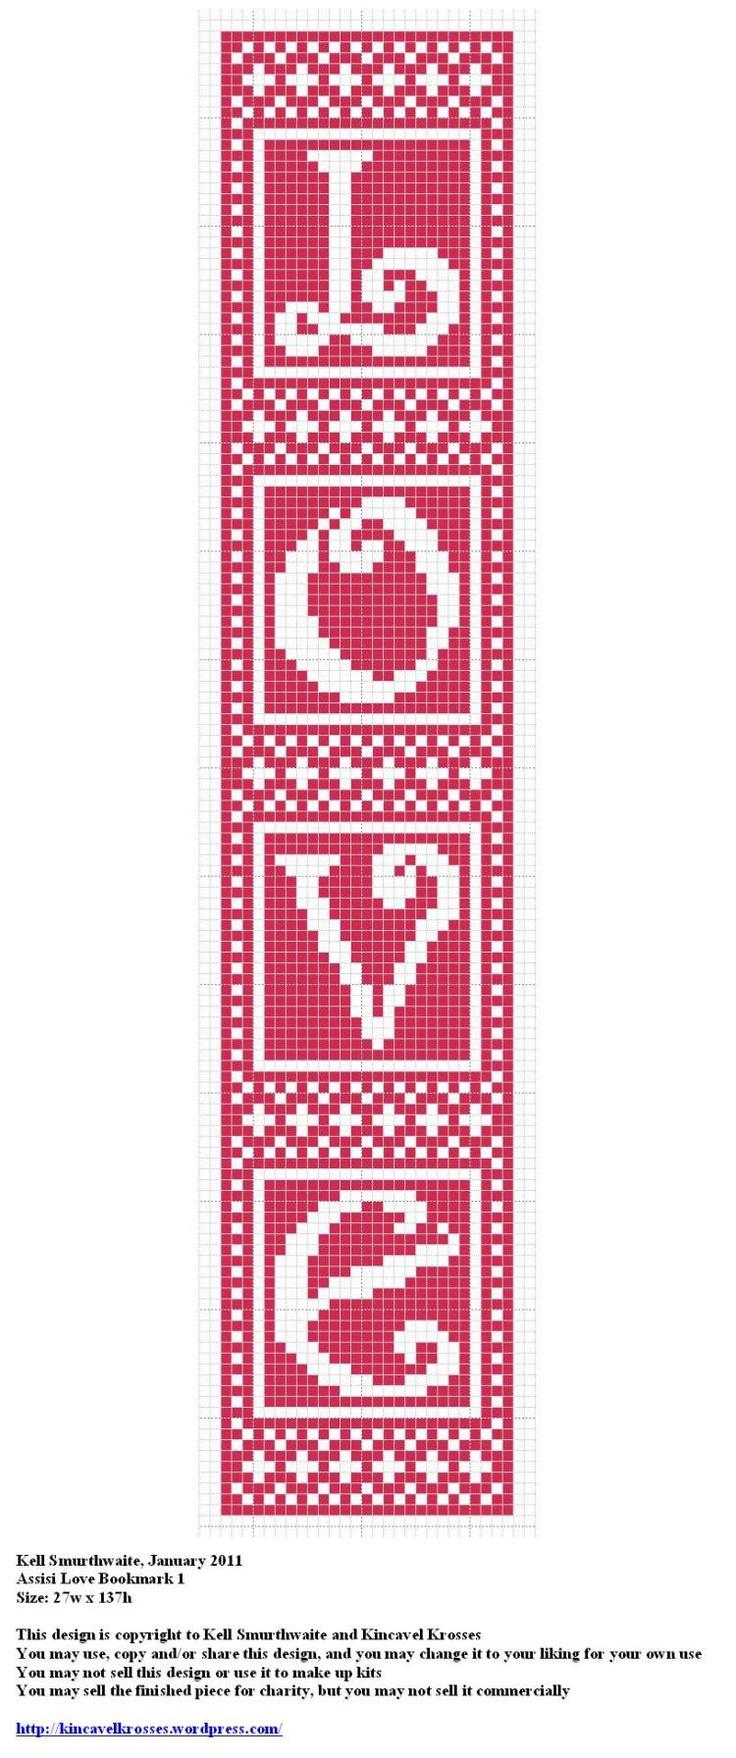 Assisi Love Bookmark 1 free cross stitch chart